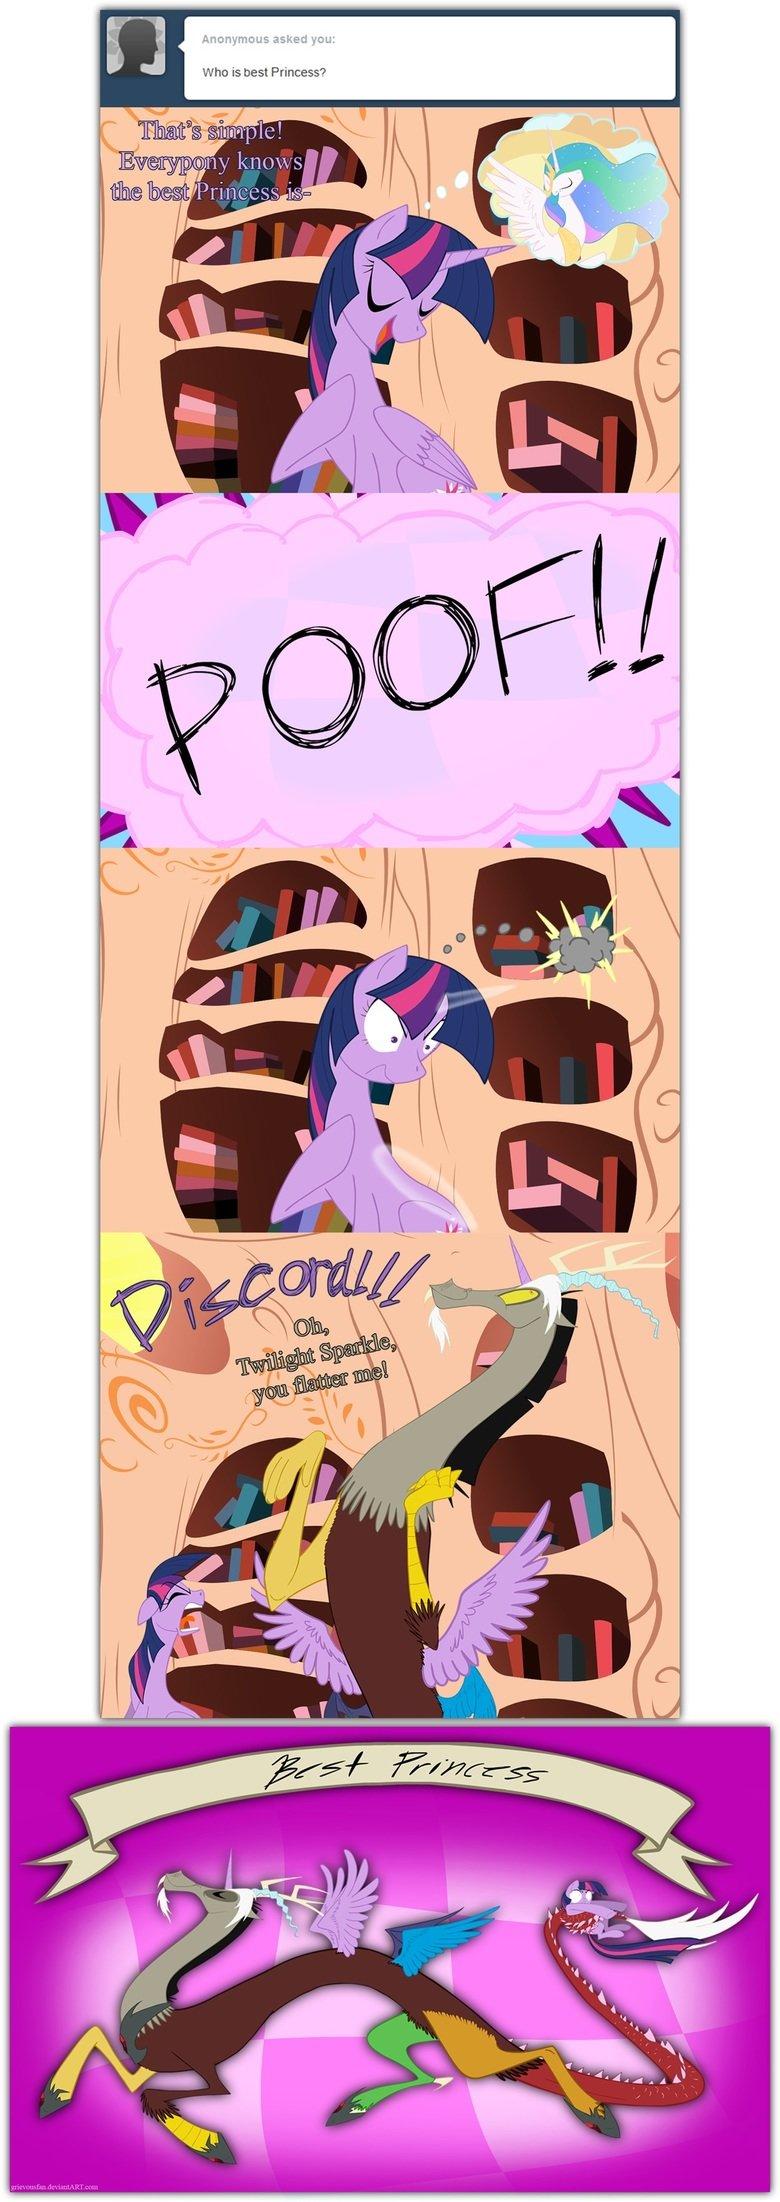 Best Princess. grievousfan.deviantart.com/art/Best-Princess-368041211.. Gummy ponies comic